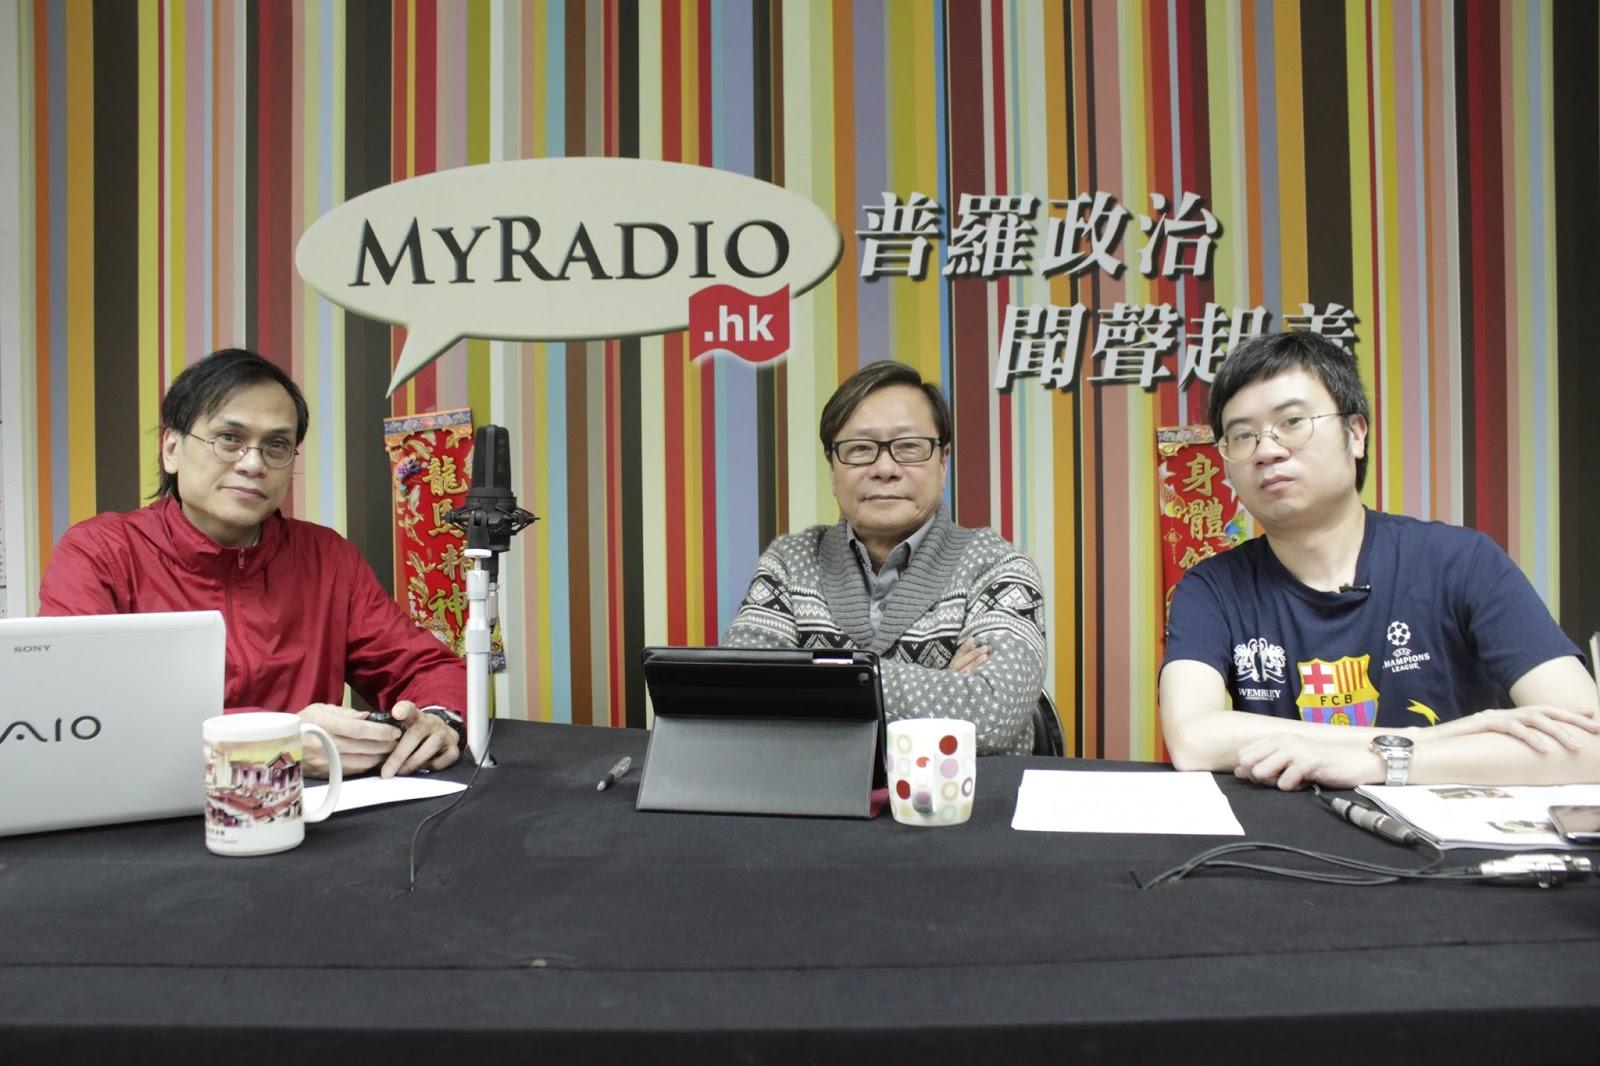 MyRadio.HK 臺務網誌: 毓民踩場 140217 ep564